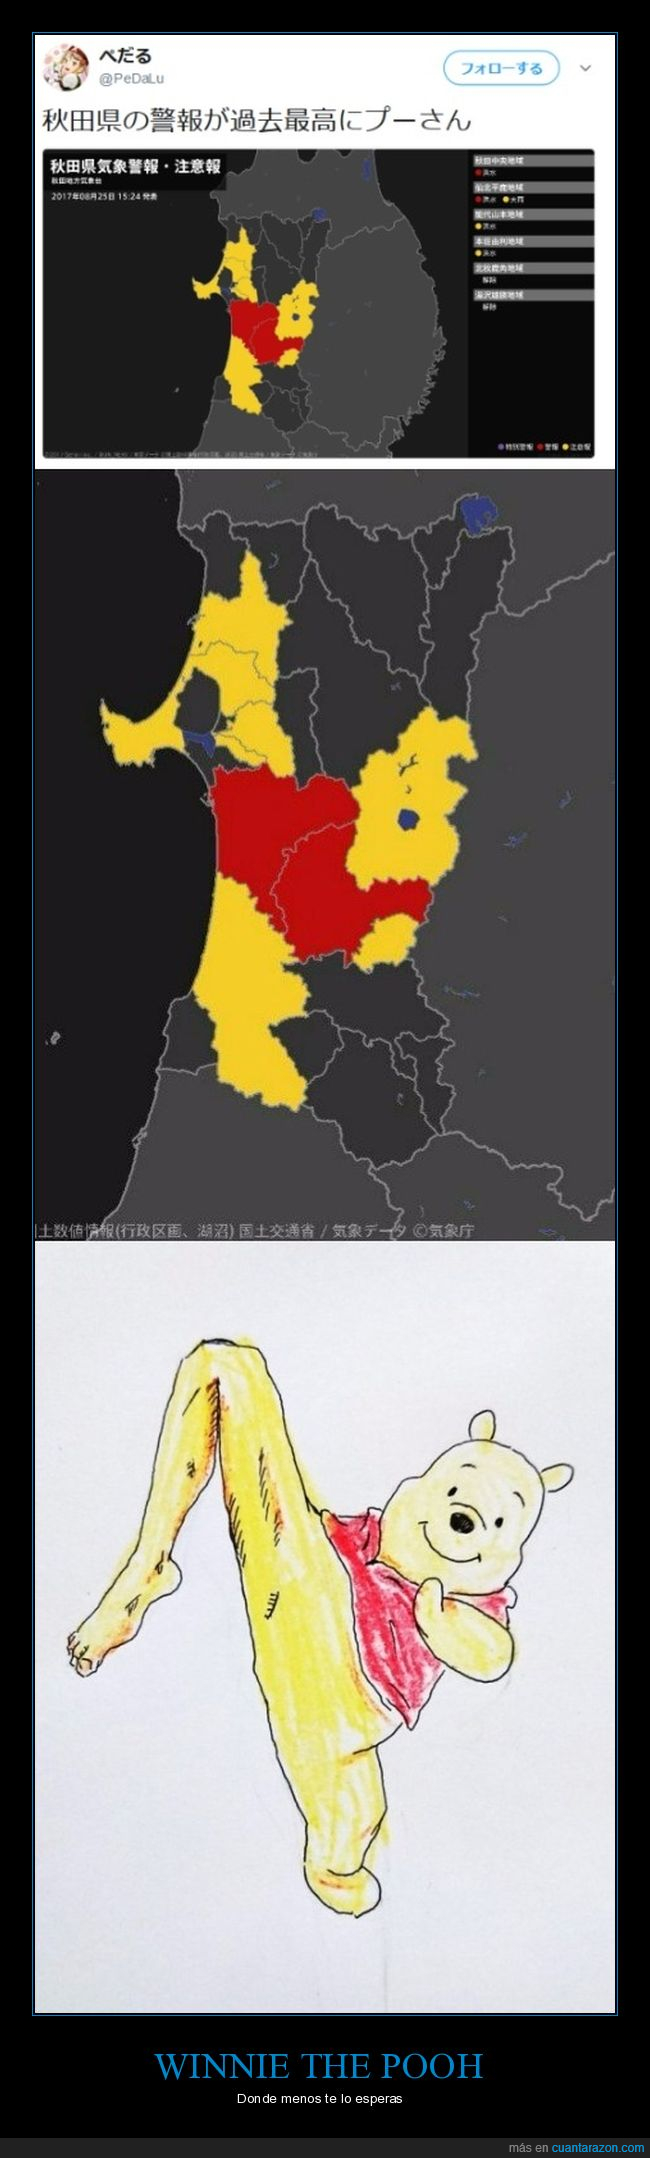 mapa,winnie the pooh